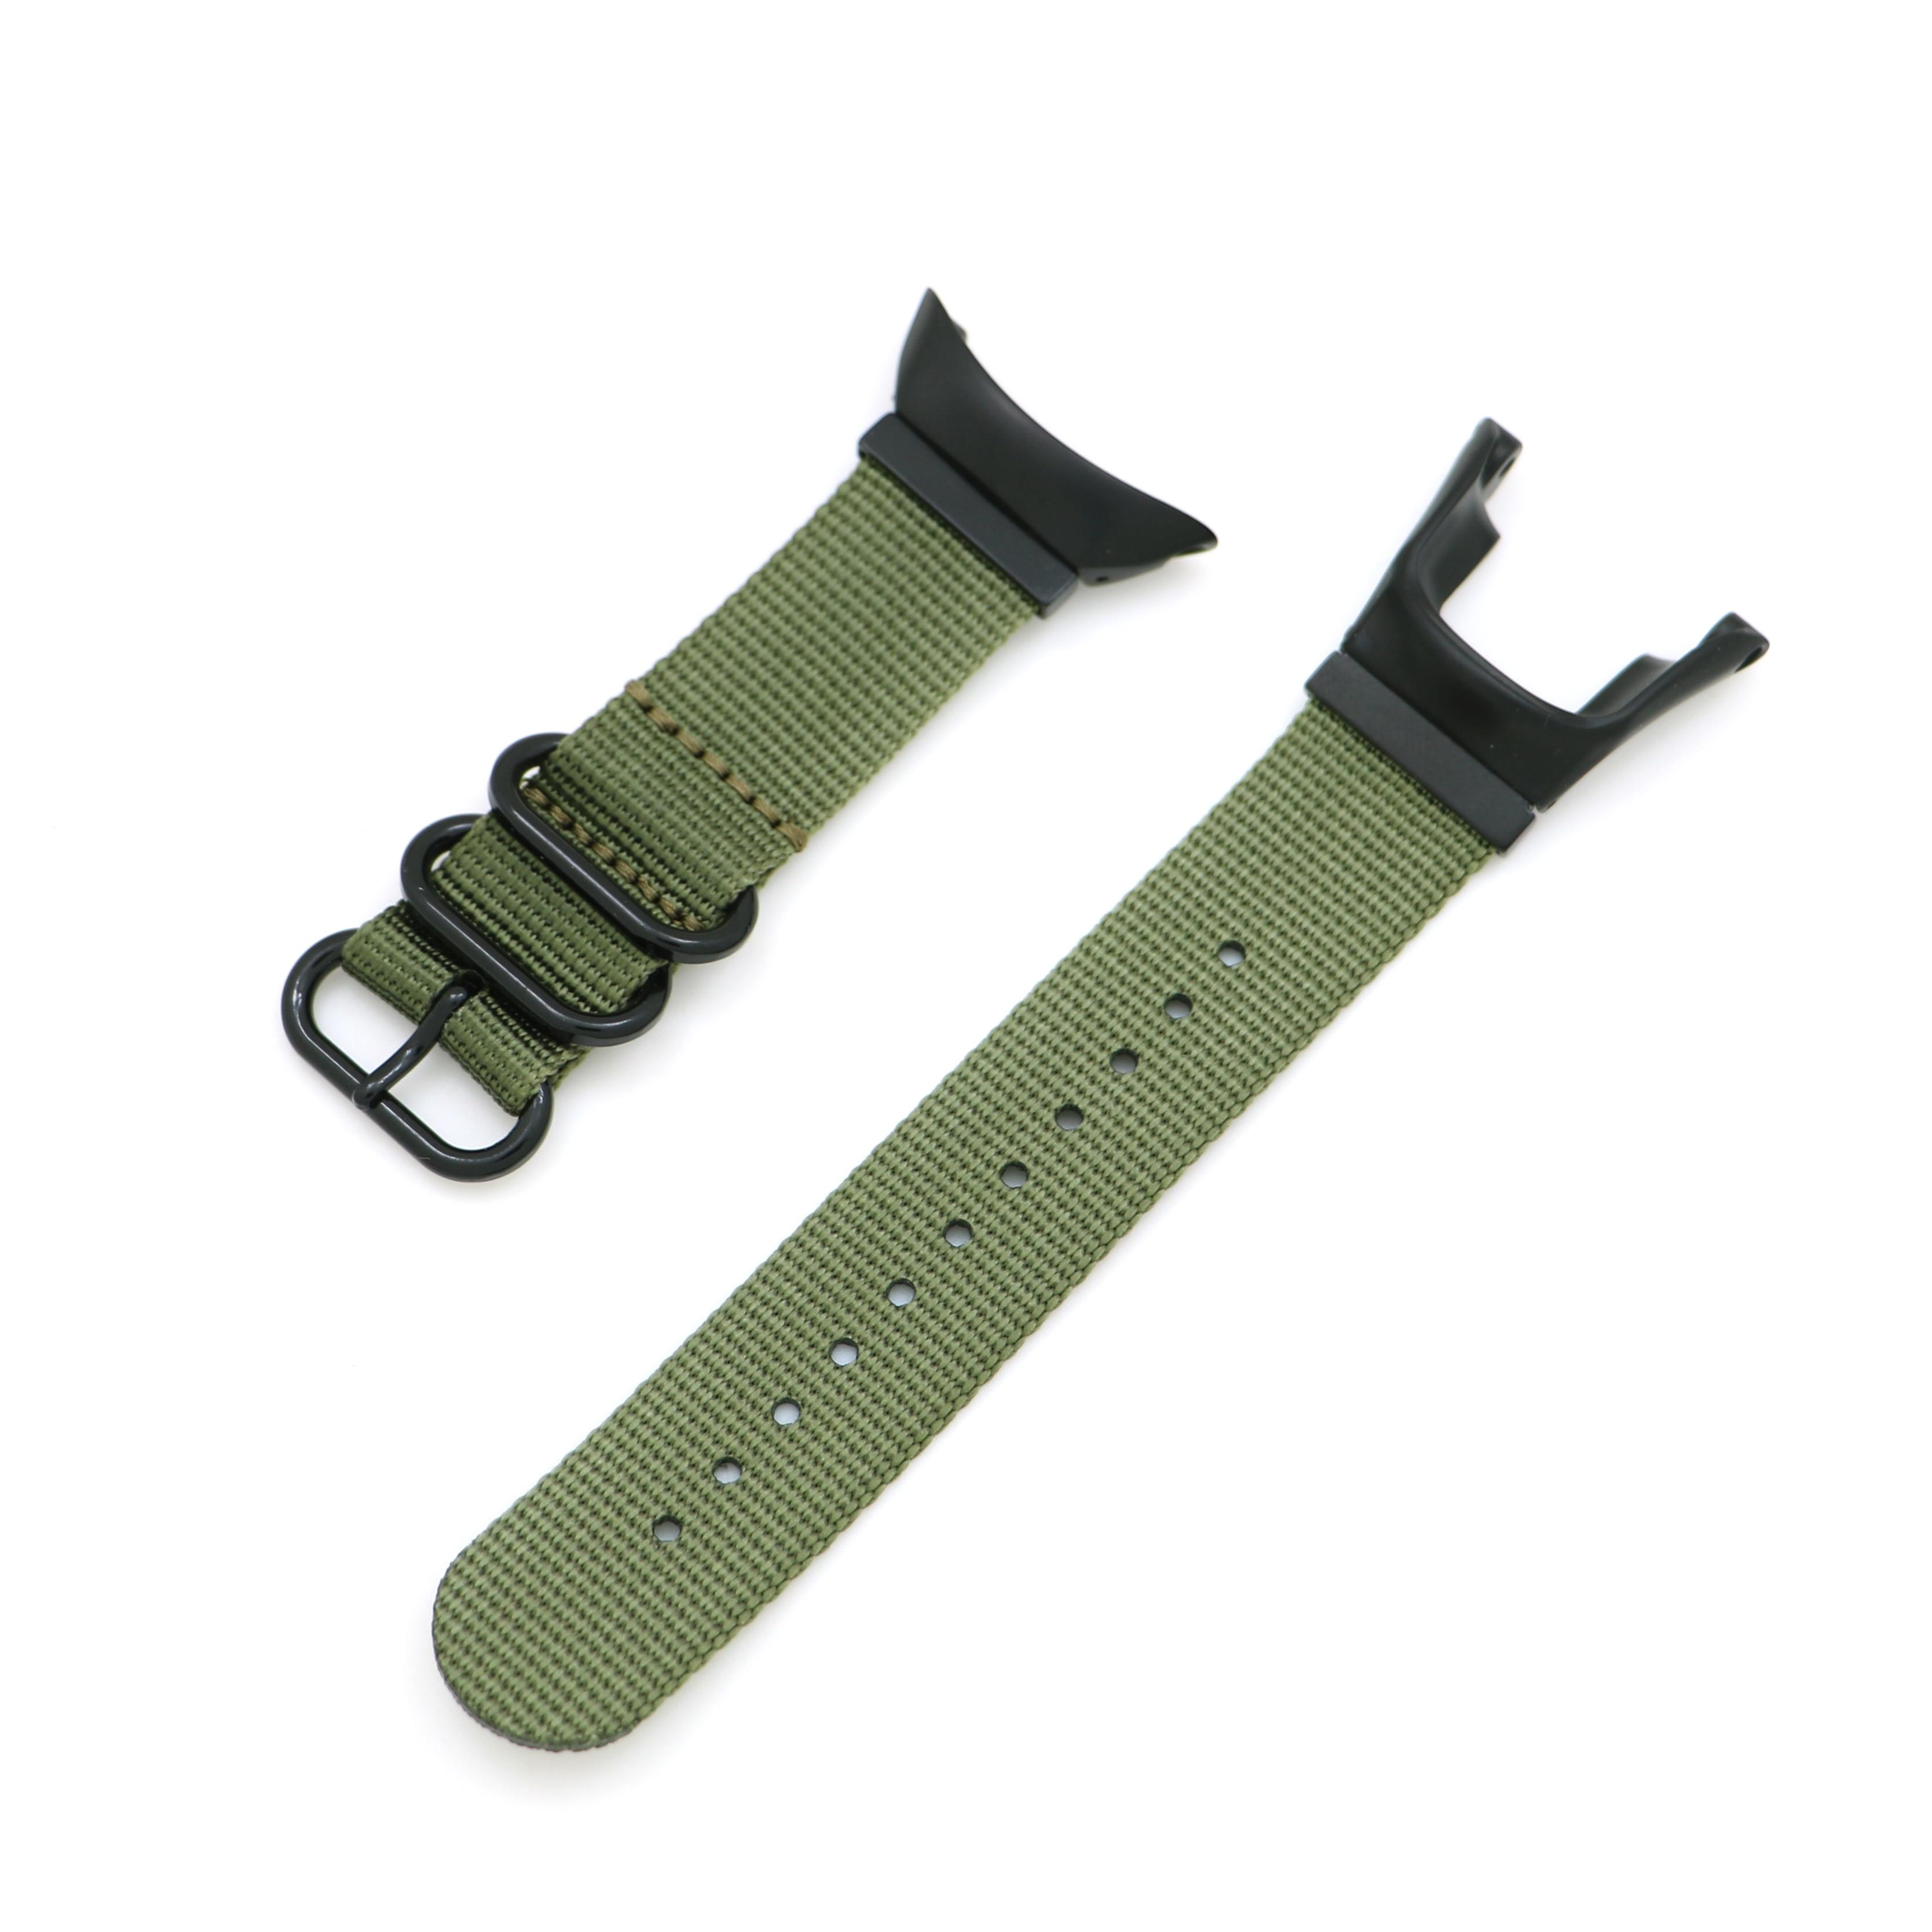 Wtitech-Correa de nailon de repuesto para reloj, pulsera para Suunto Ambit/Ambit2/Ambit3 Sport/Run/Peak